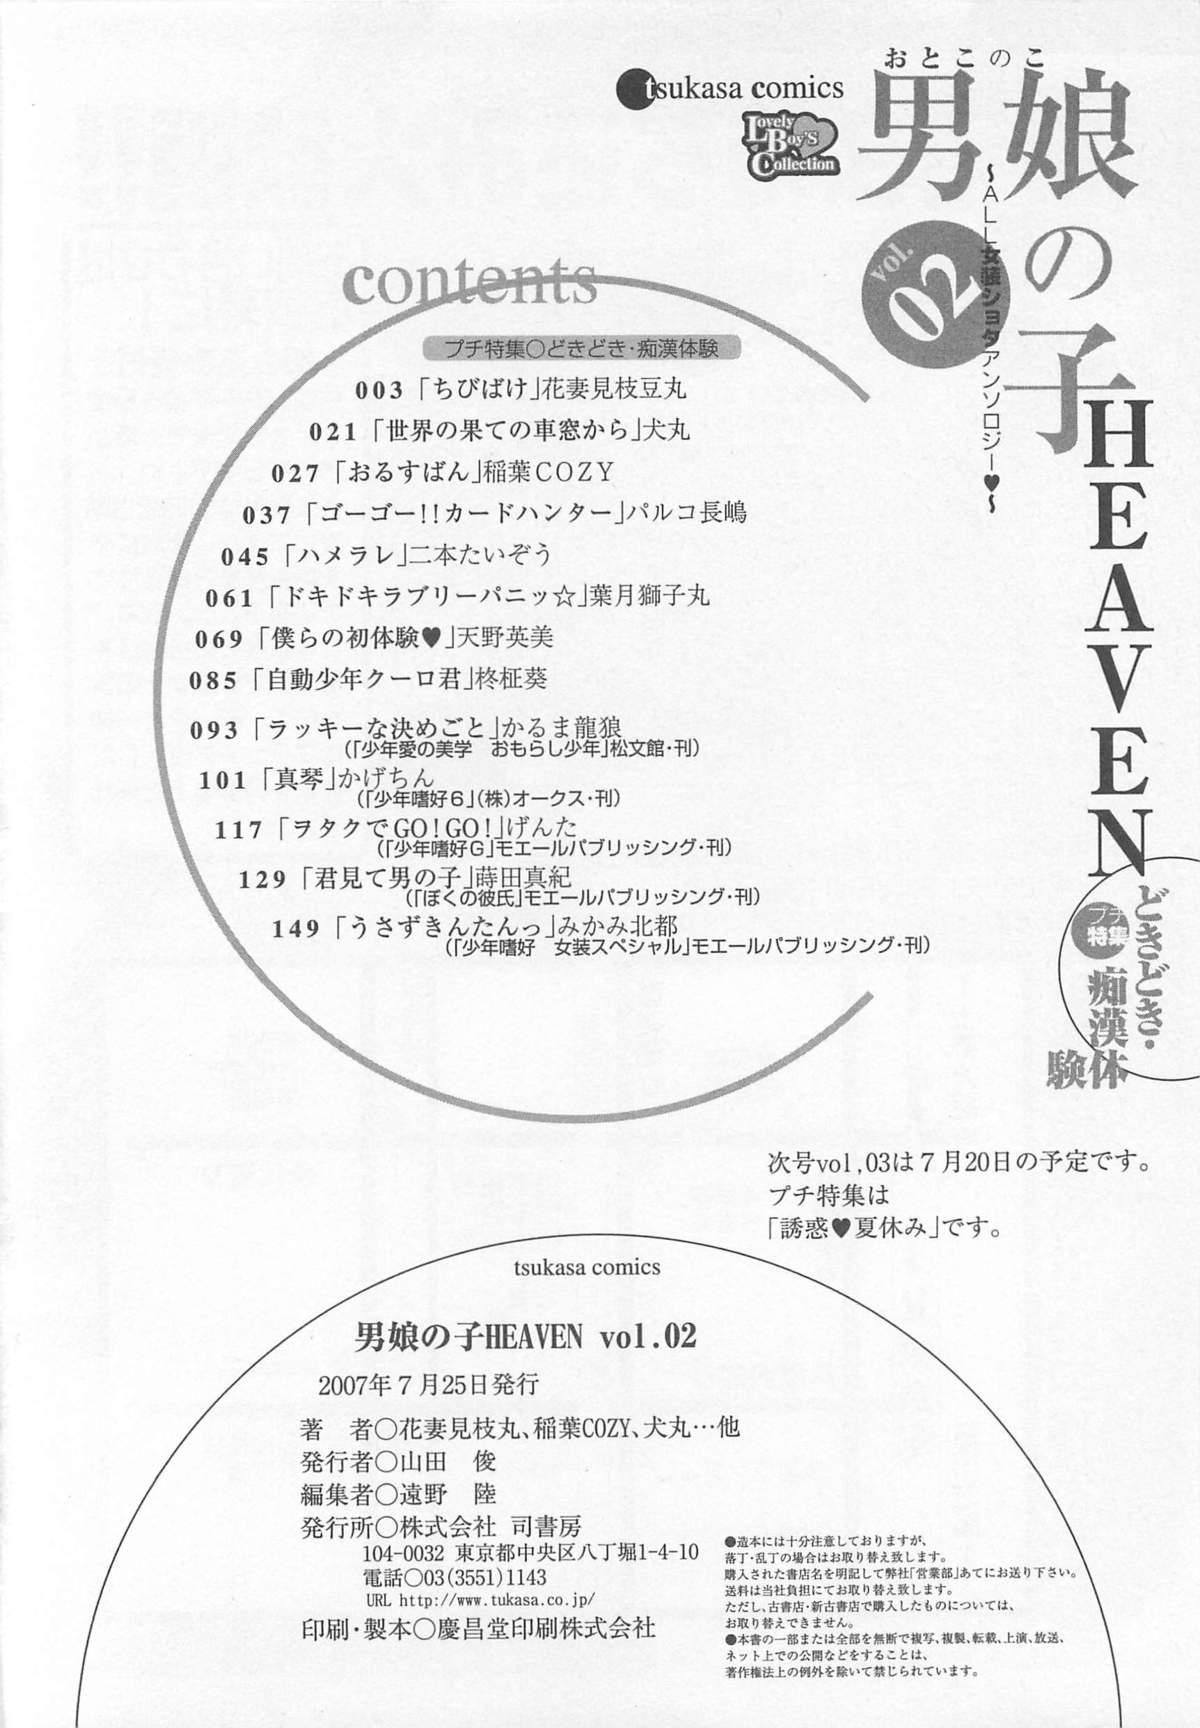 Otokonoko HEAVEN Vol. 02 Dokidoki Chikan Taiken 166